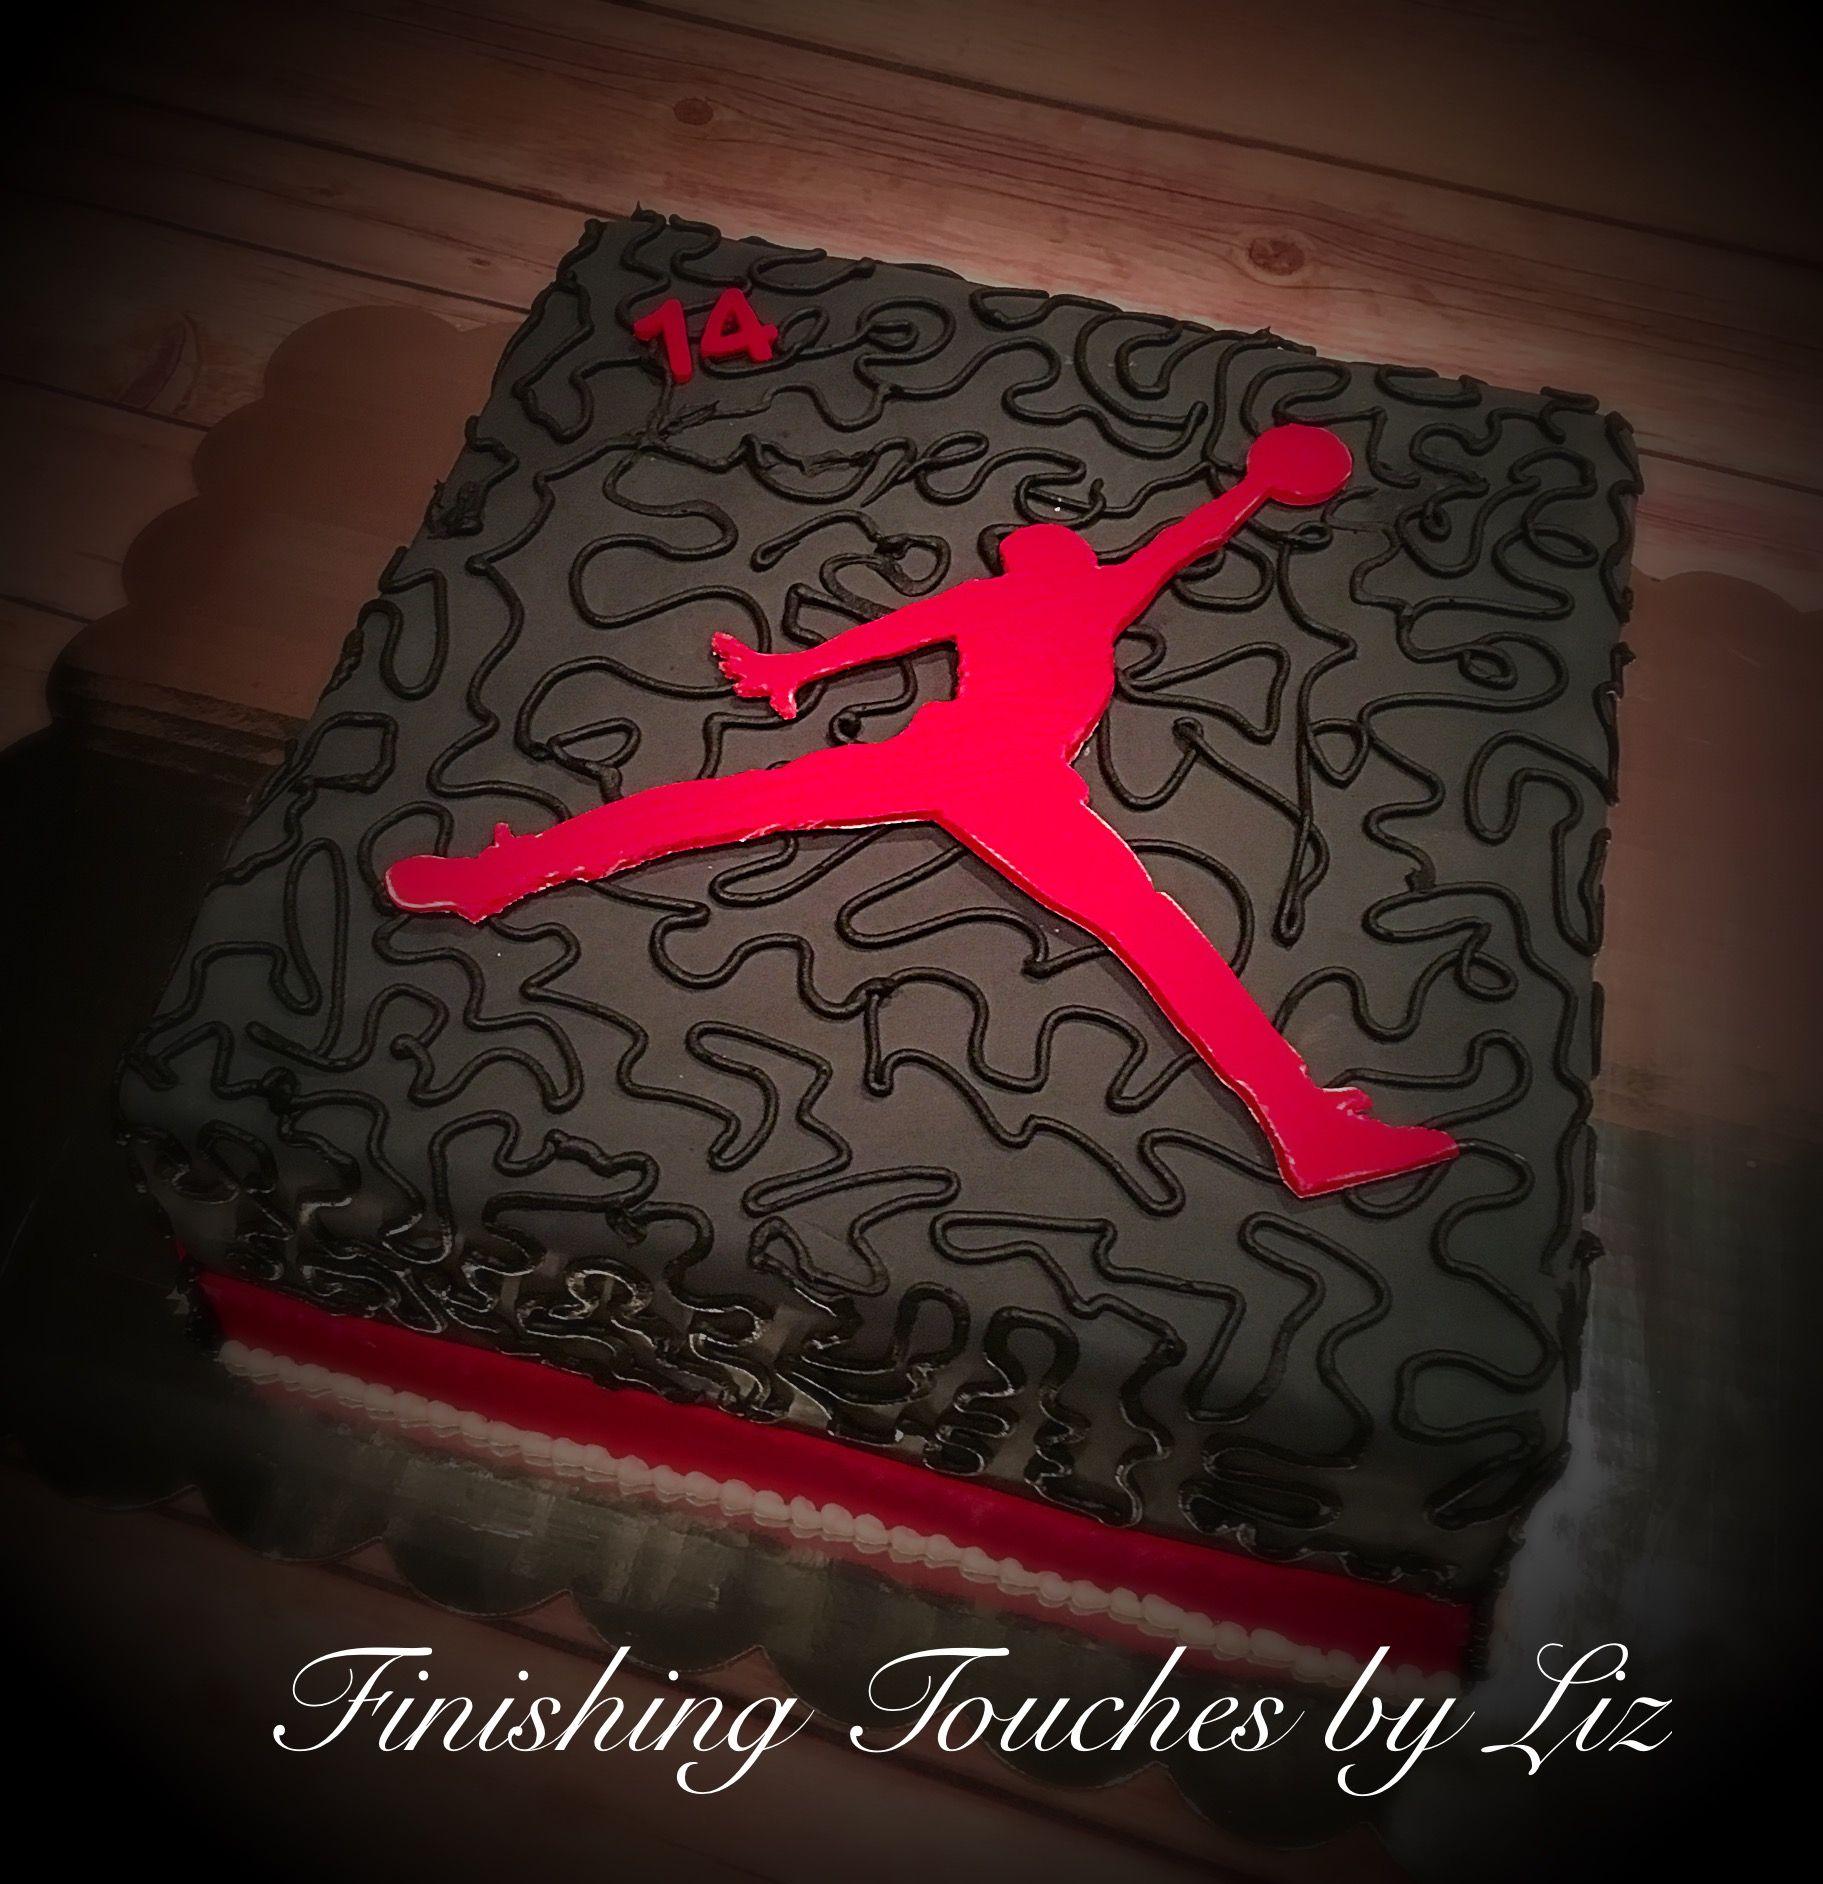 Air Jordan birthday cake By wwwfacebookcomfinishingtouchesbyliz